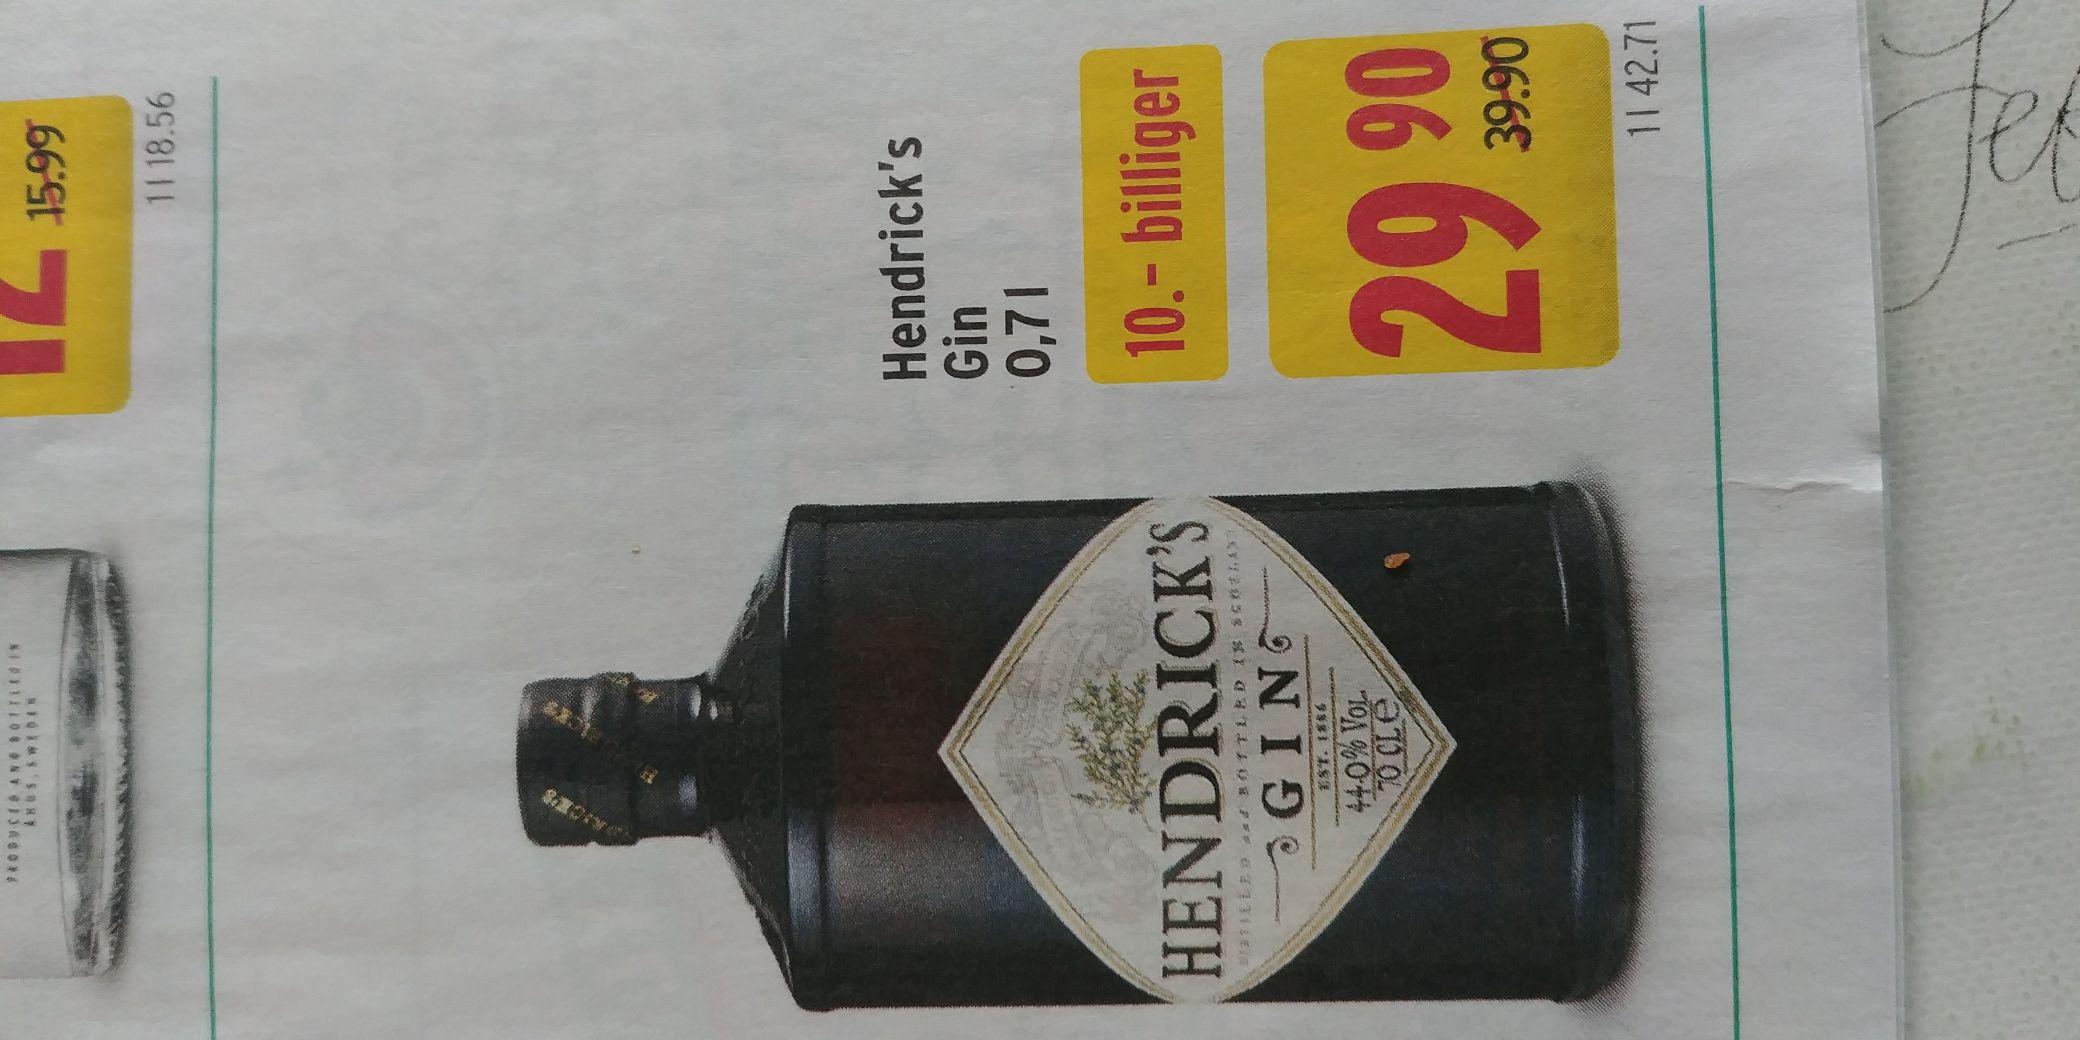 [Ö] Merkur - Hendricks Gin 0.7l